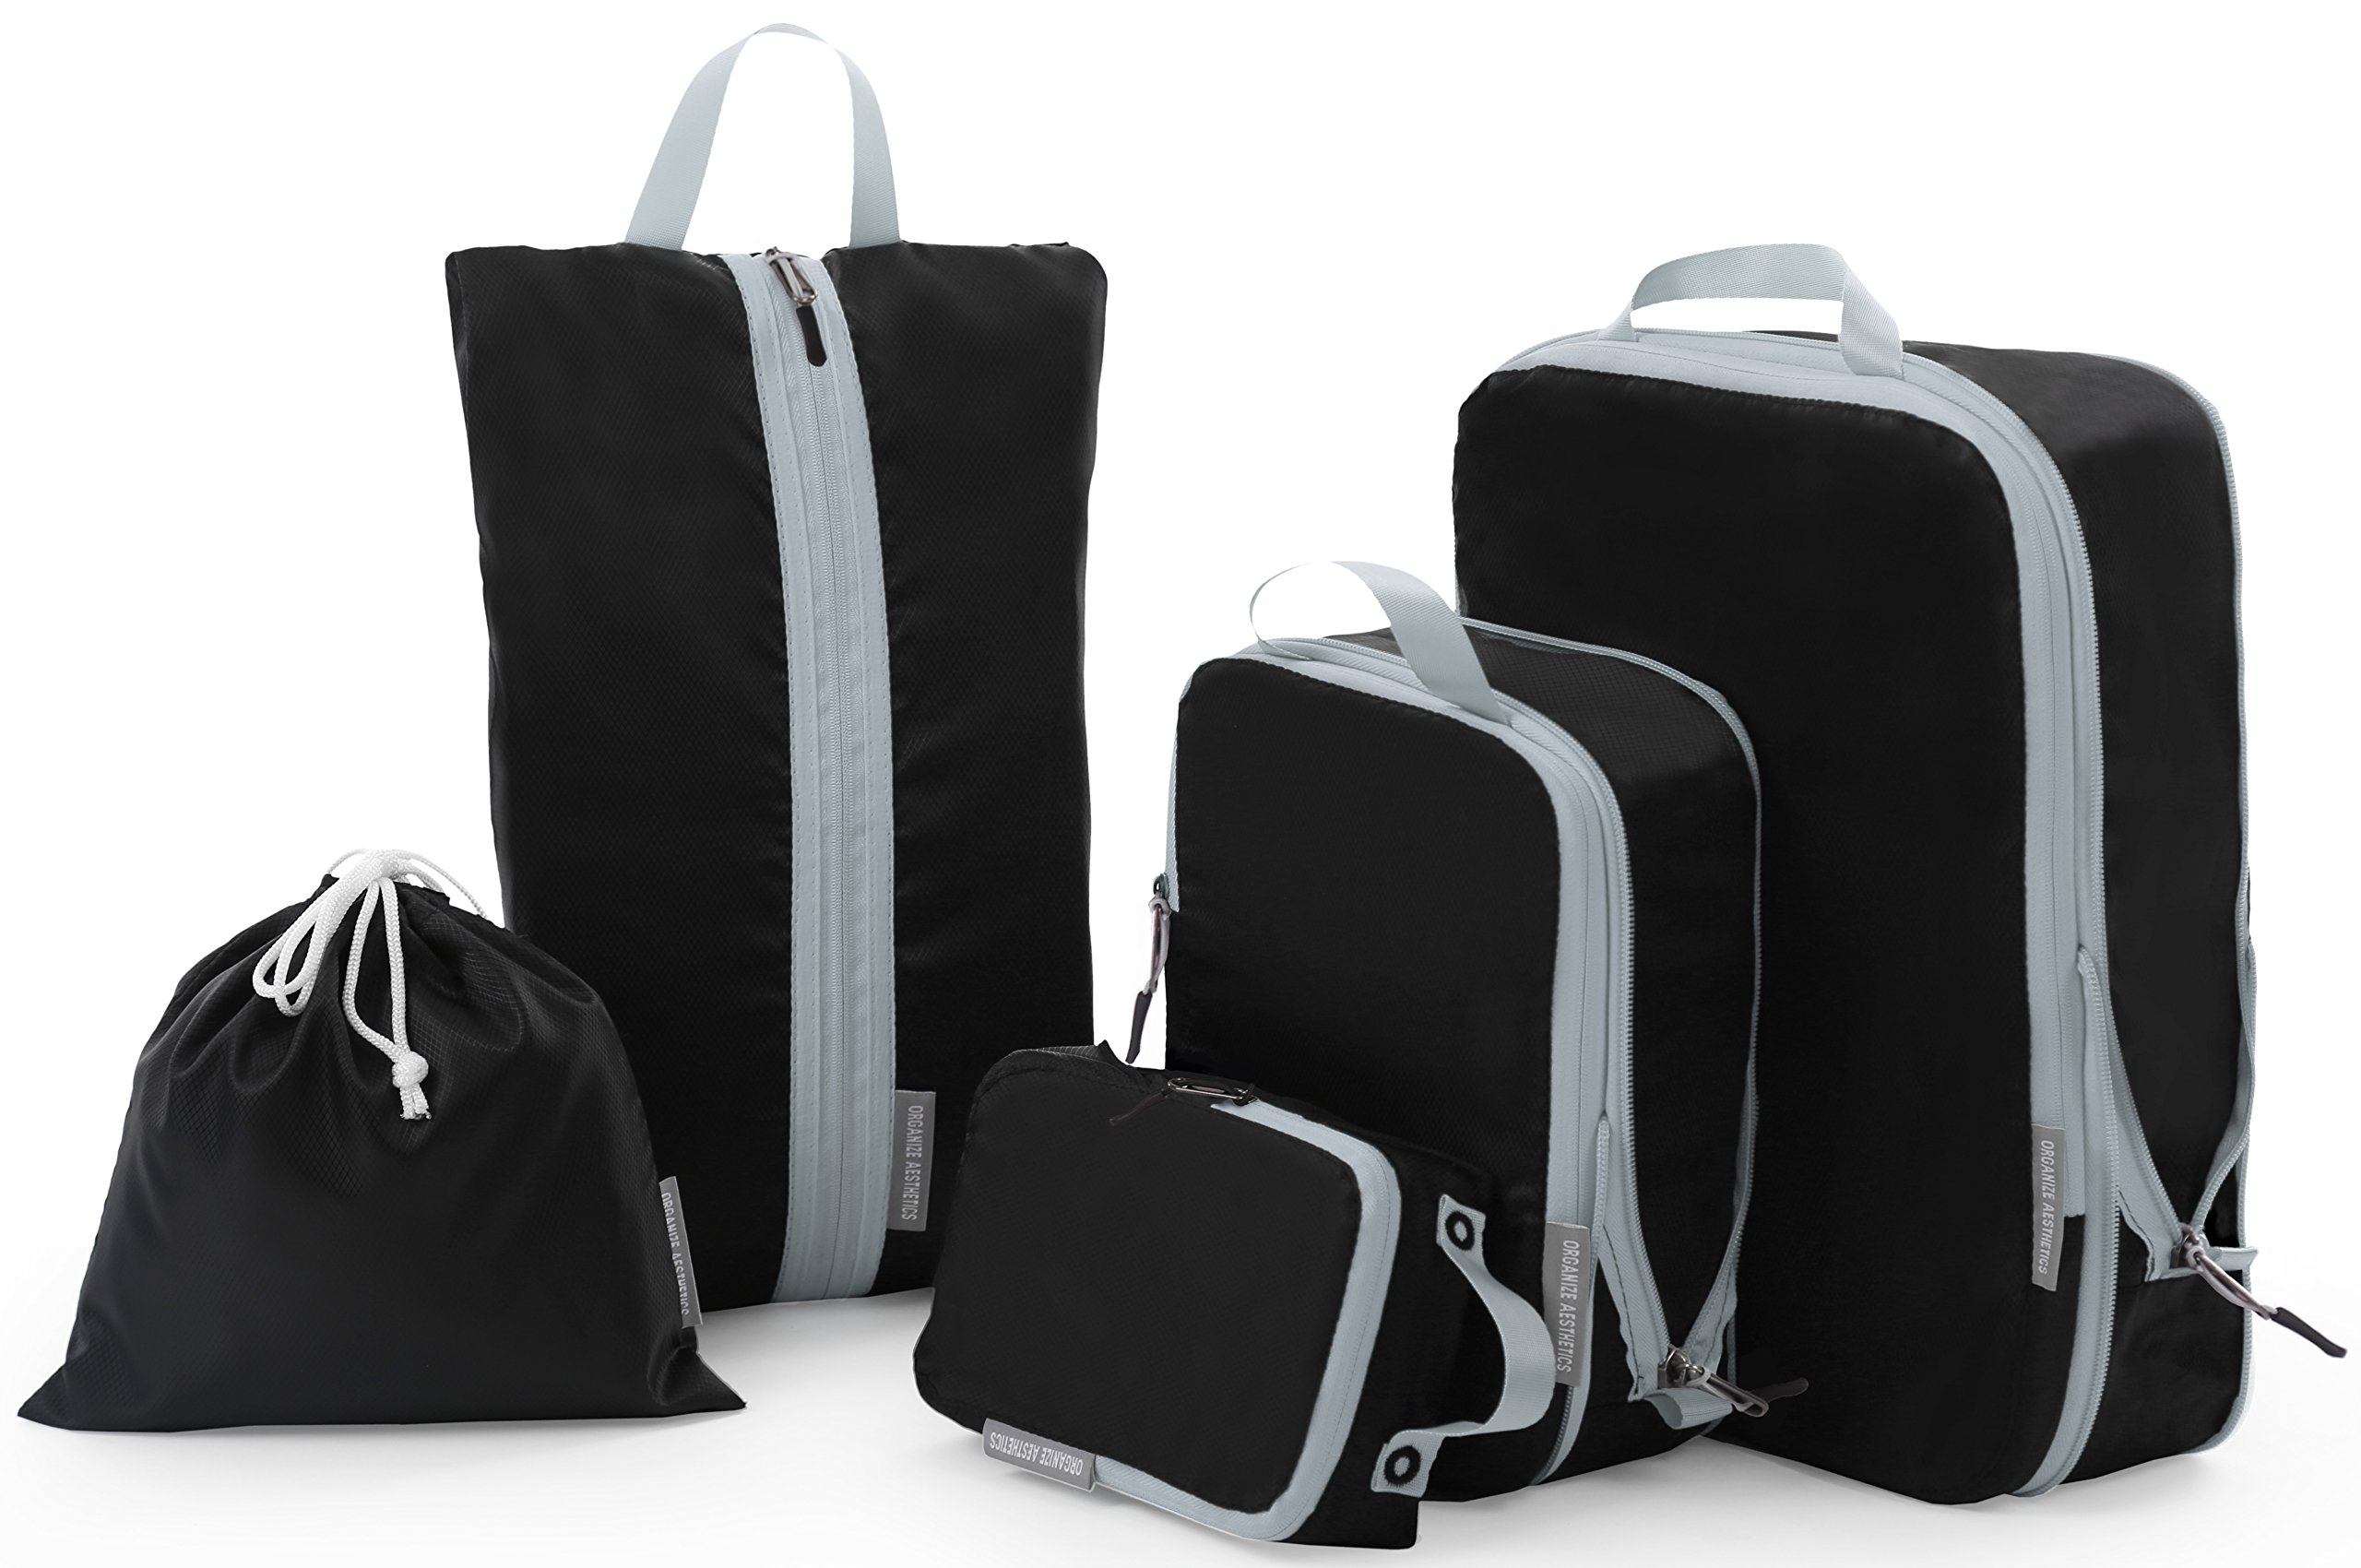 Compression Packing Cubes, JJ POWER Travel Backpack Organizers X-Large 2 Set (Five set- Black)